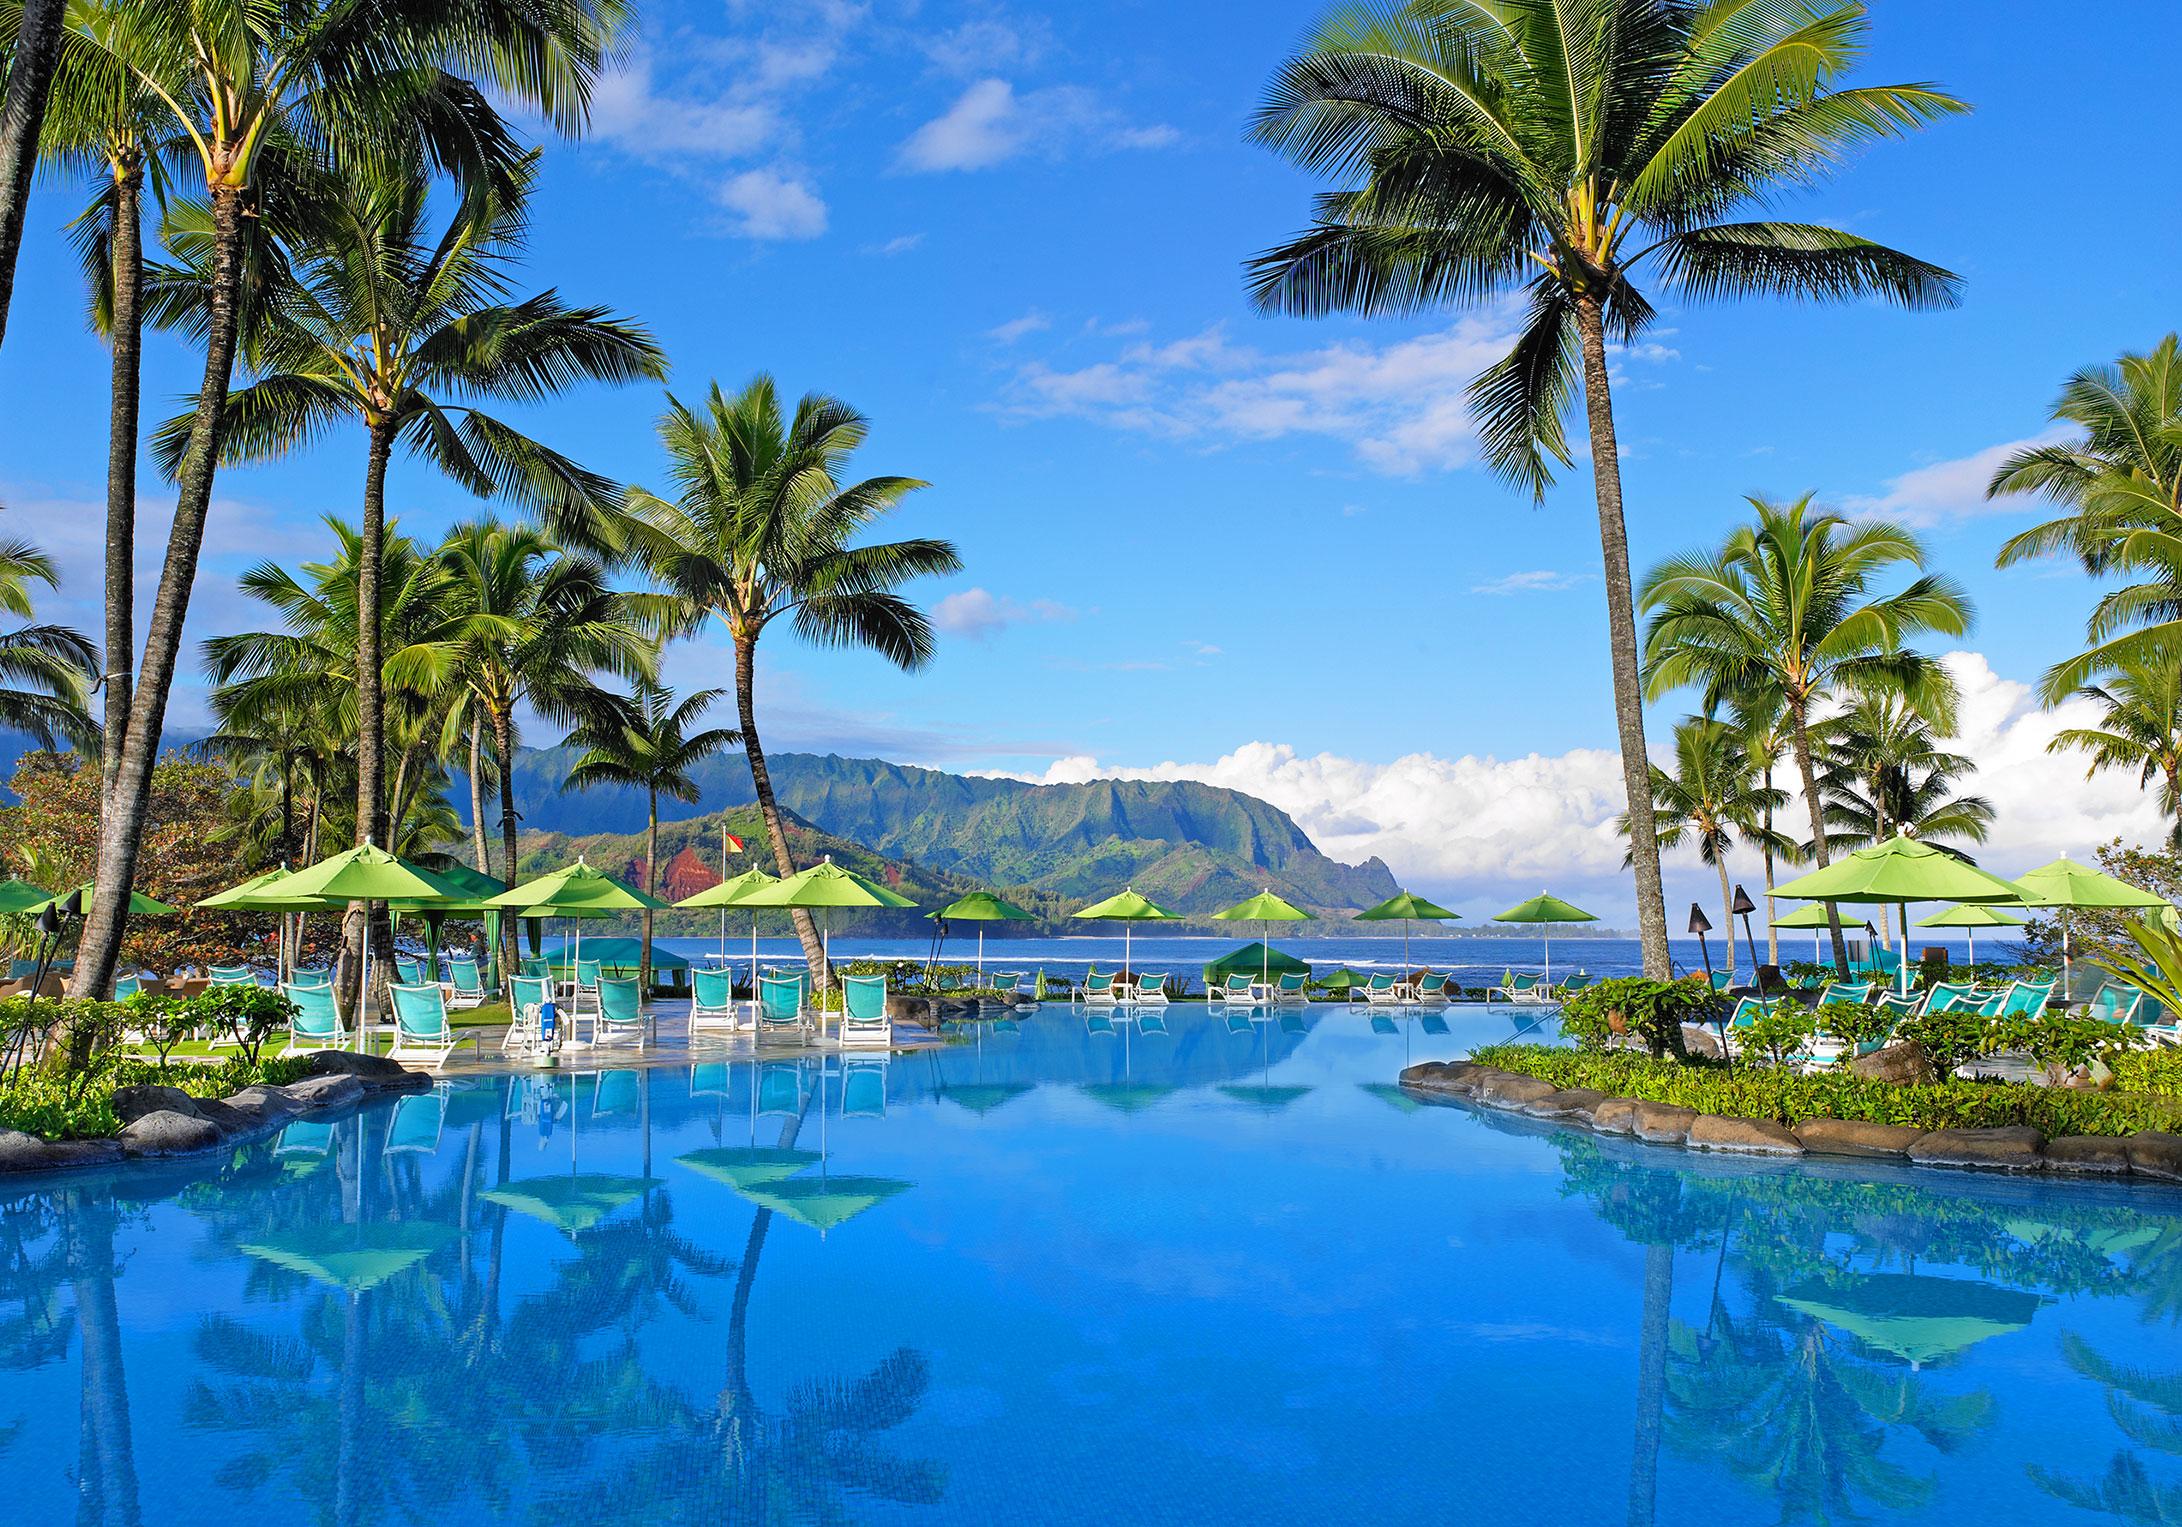 PunjabKesari, Hawaii, Honeymoon Destinations, Year 2019, Travel Hindi Tips